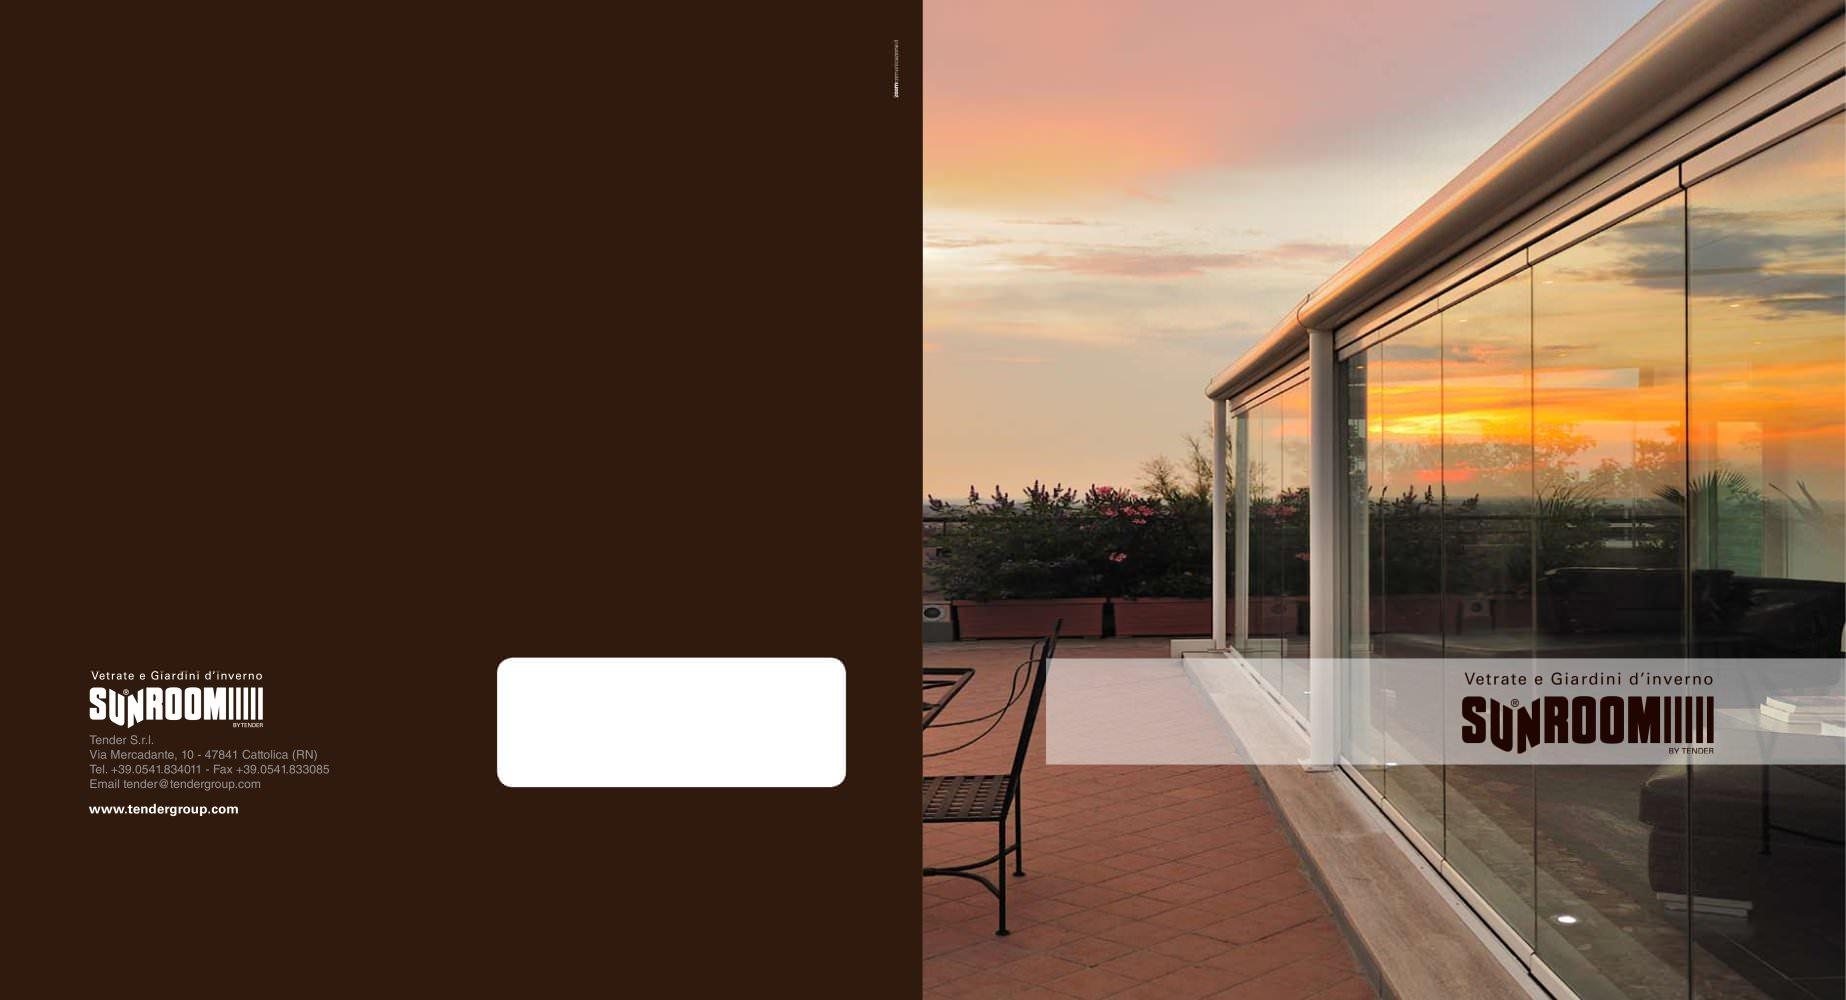 Vetrate e Giardini d'inverno - SUNROOM Tender Group - Catalogo PDF ...